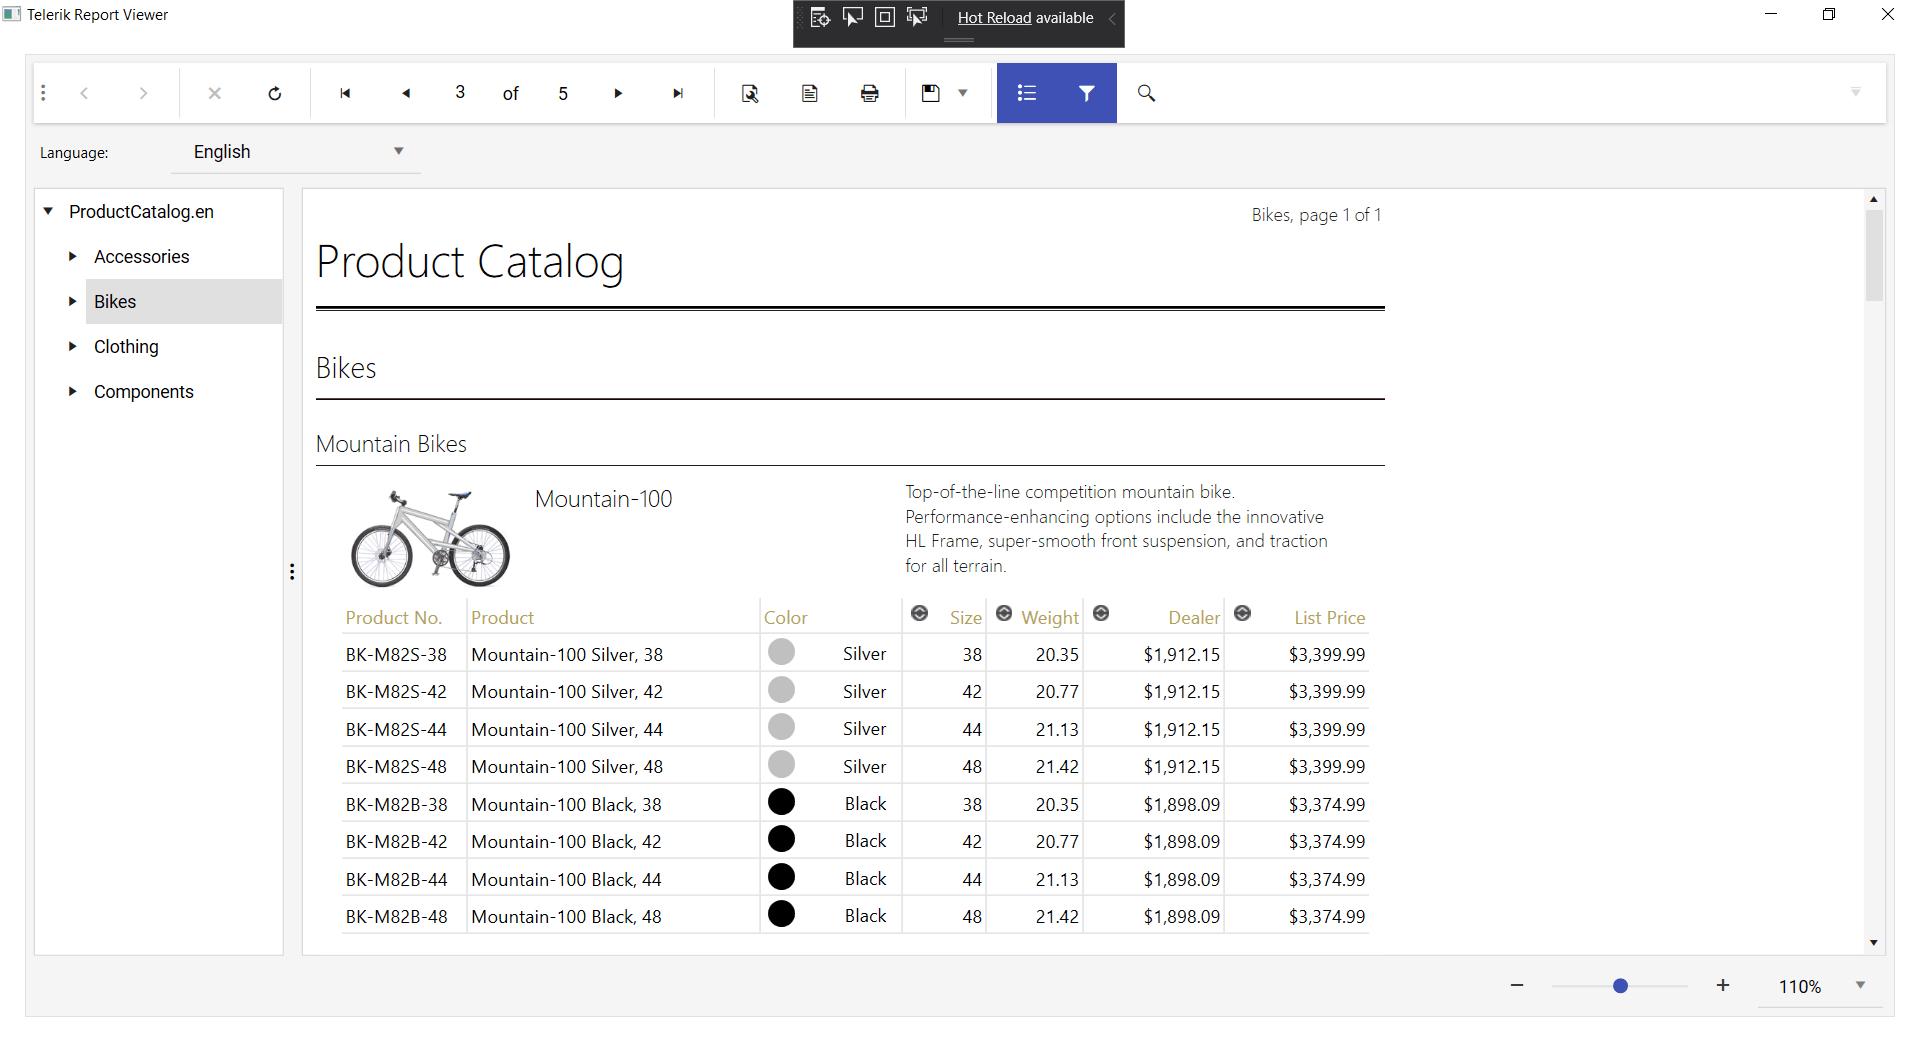 Product catalog of bikes